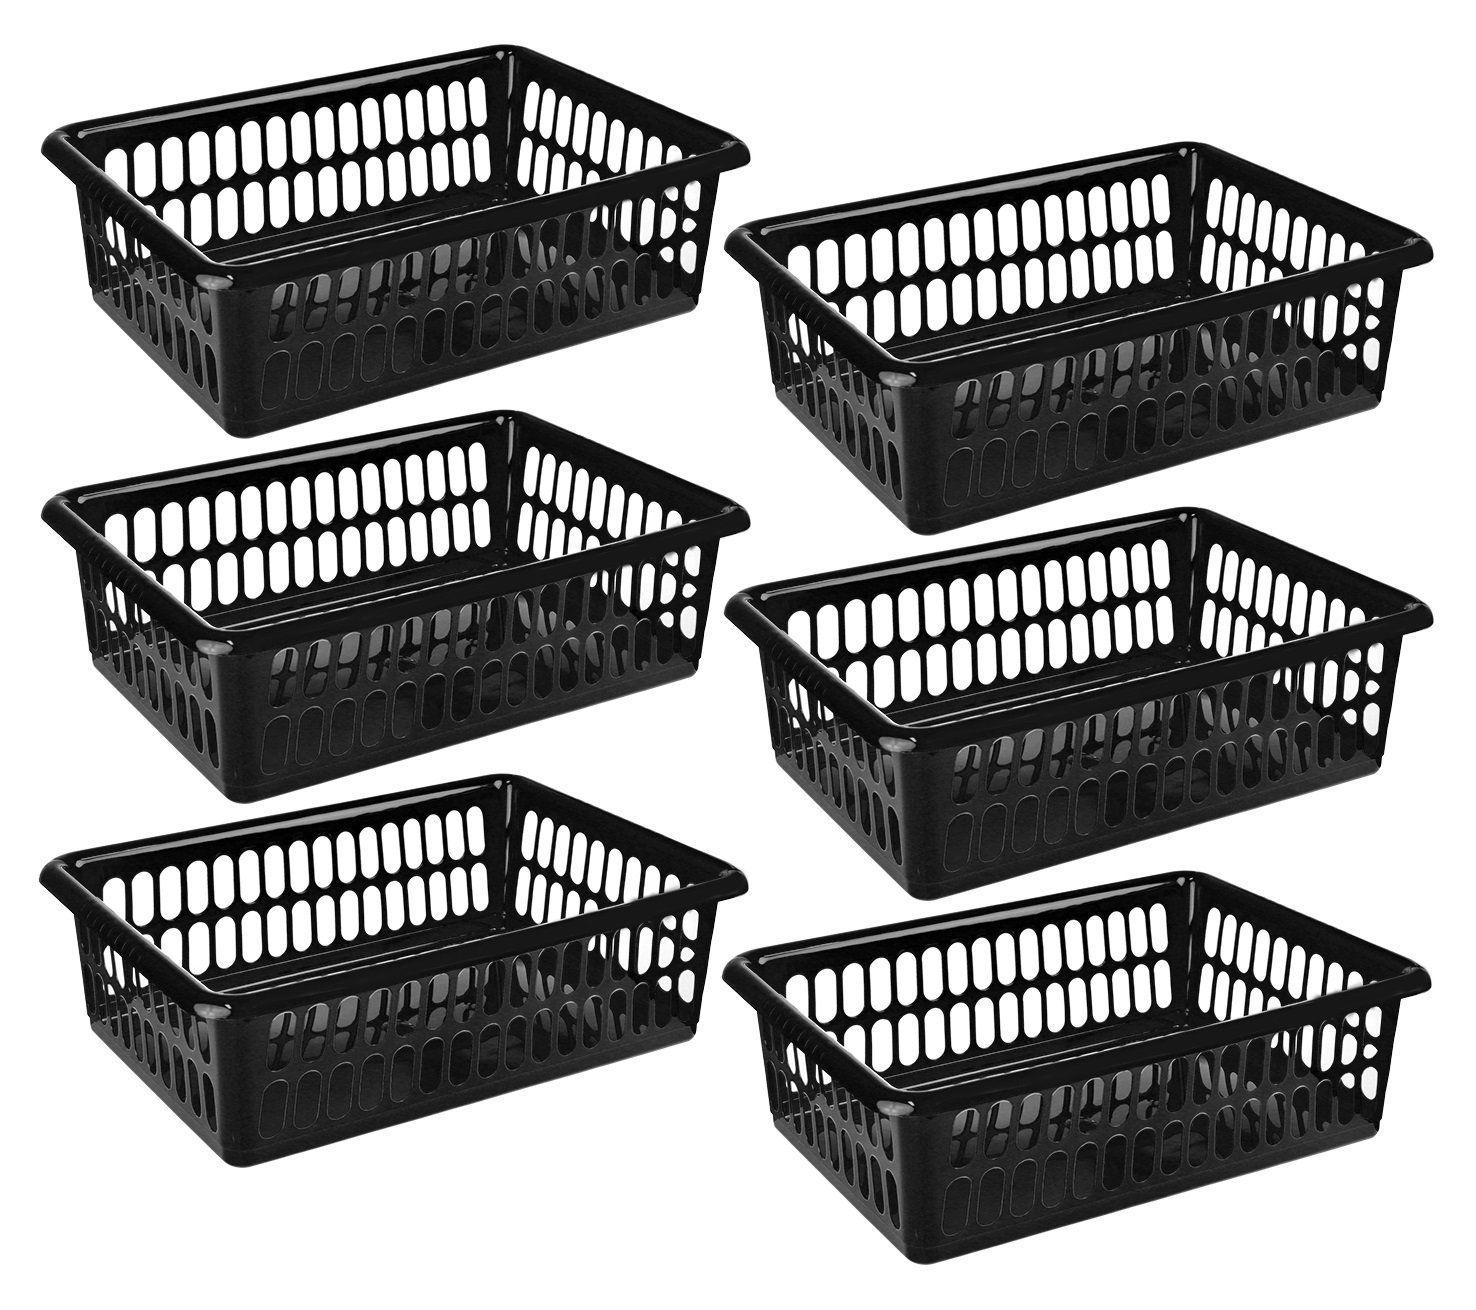 Zilpoo 6 Pack - Plastic Storage Organizing Baskets Food Pantry Closet Shelves... 1